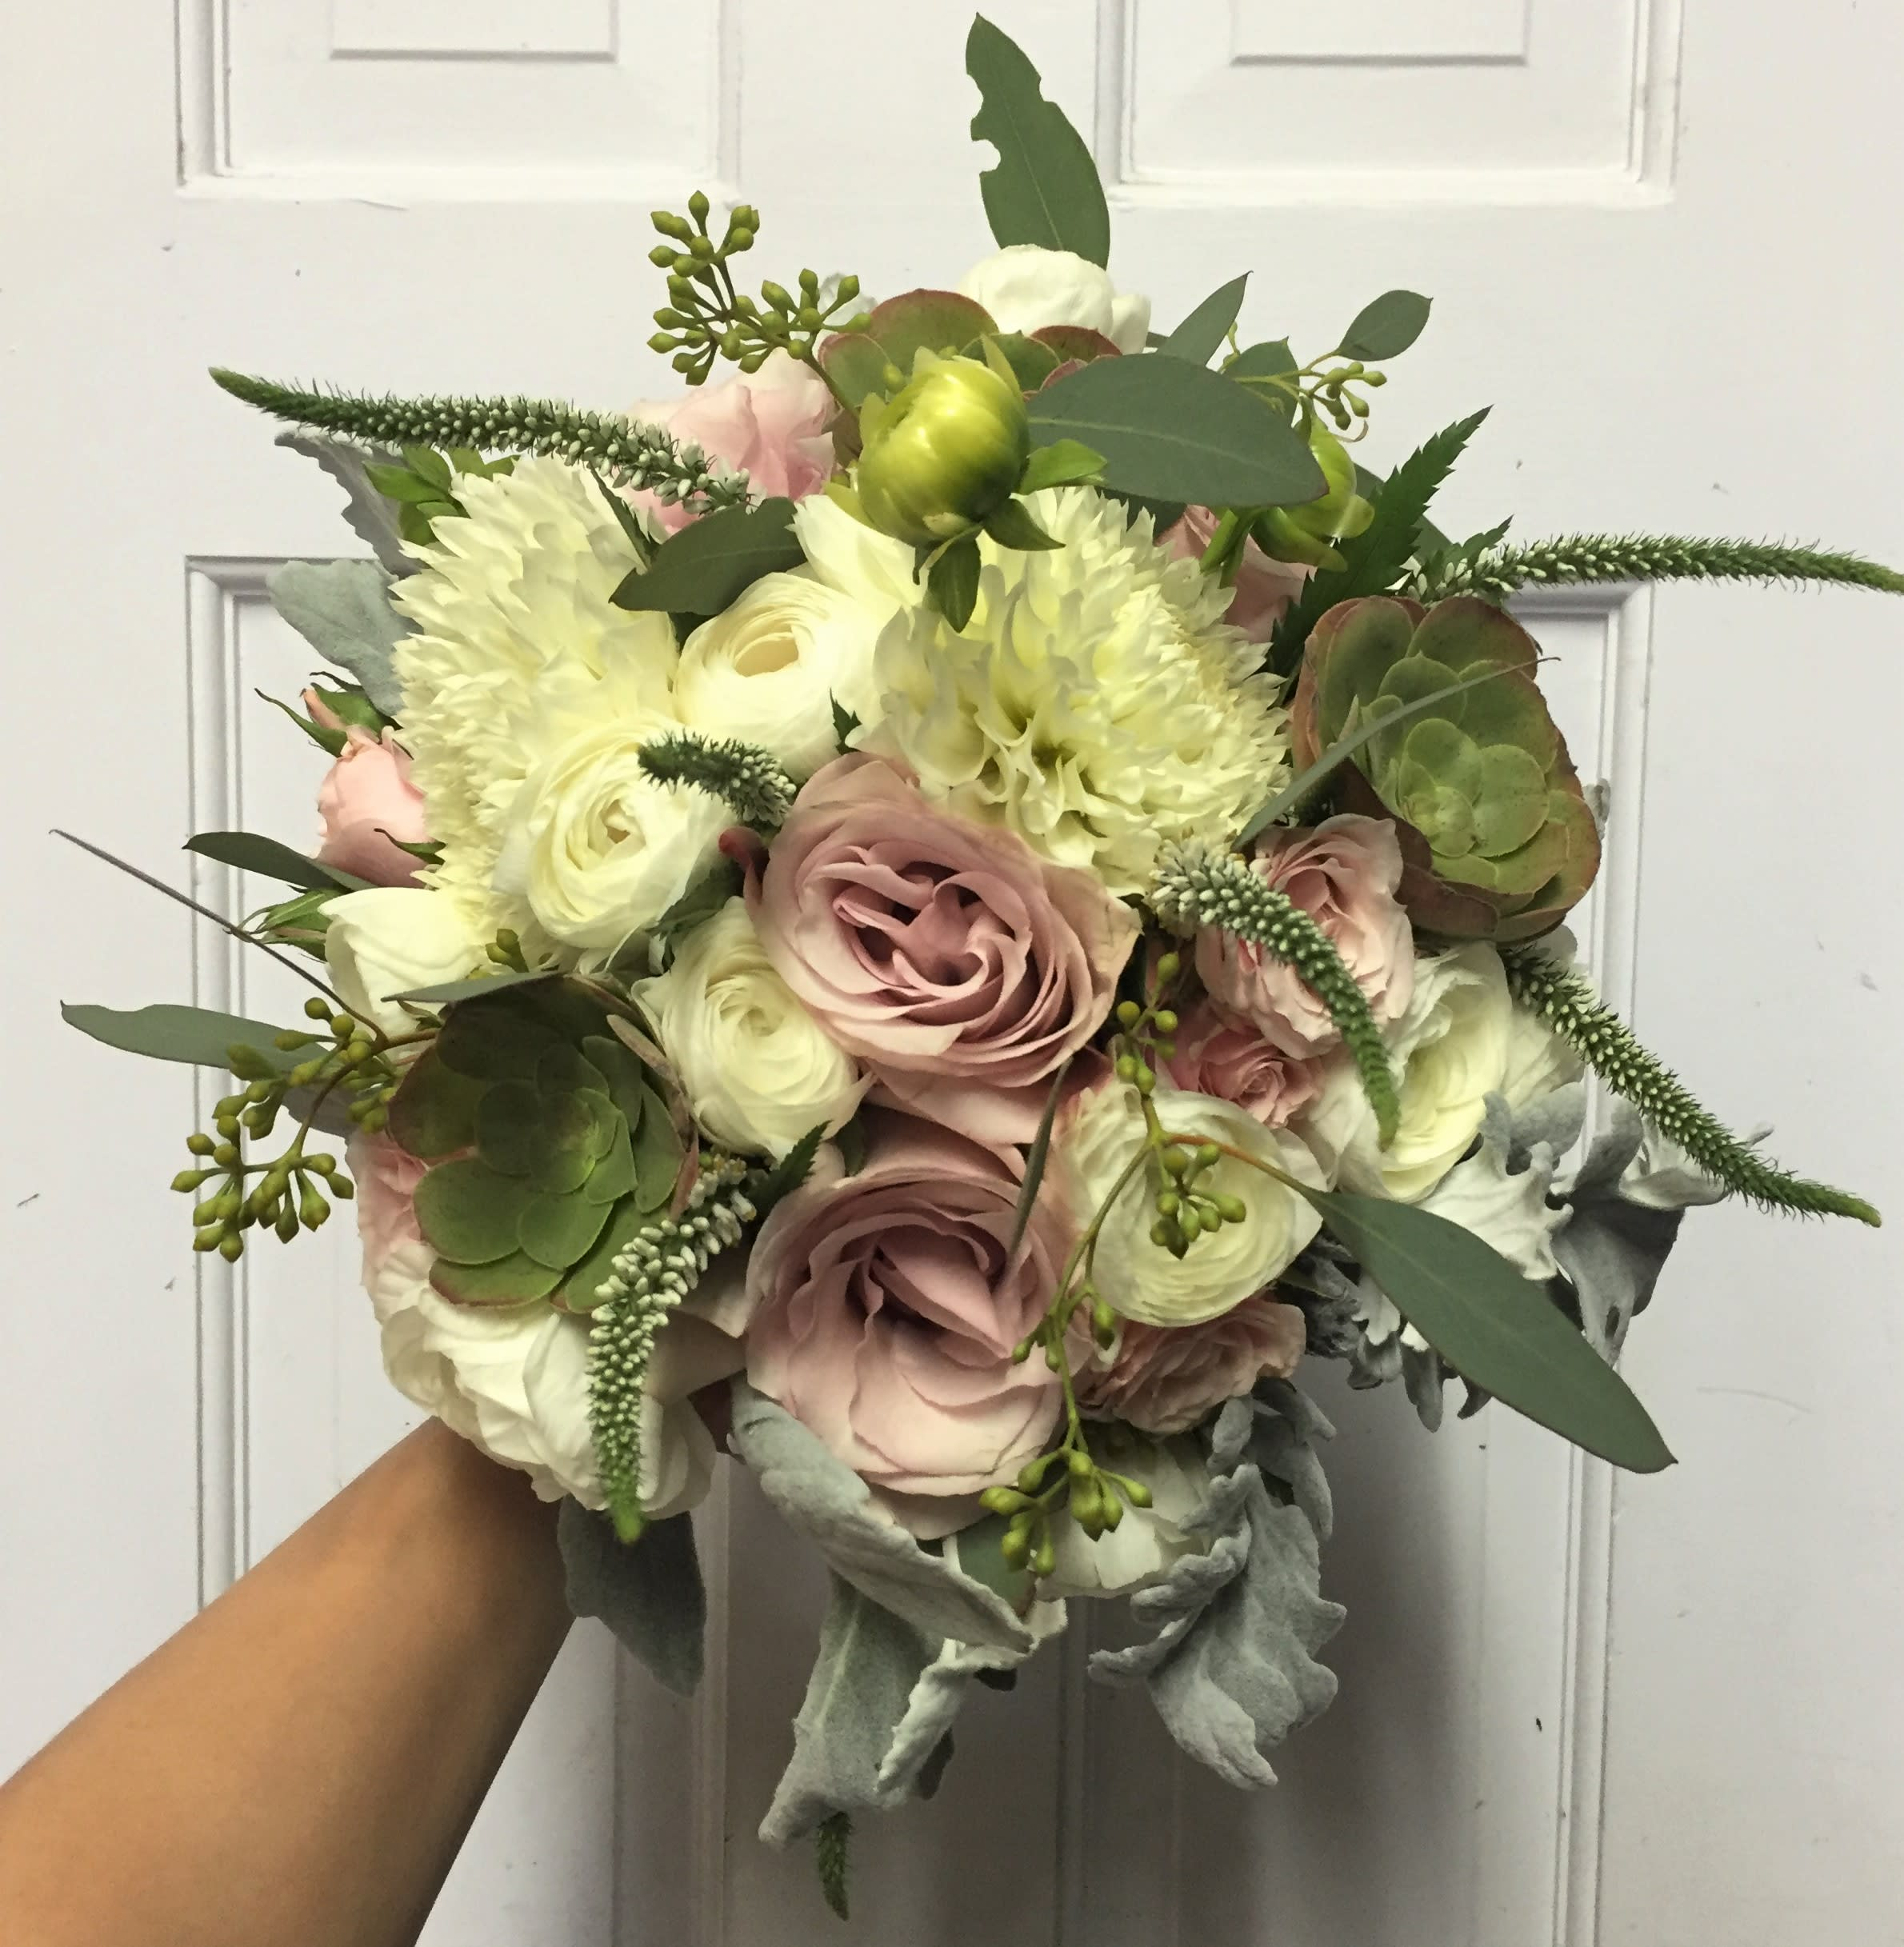 Wedding Flowers In May: Dusty Rose Bridal Boquet In San Francisco, CA